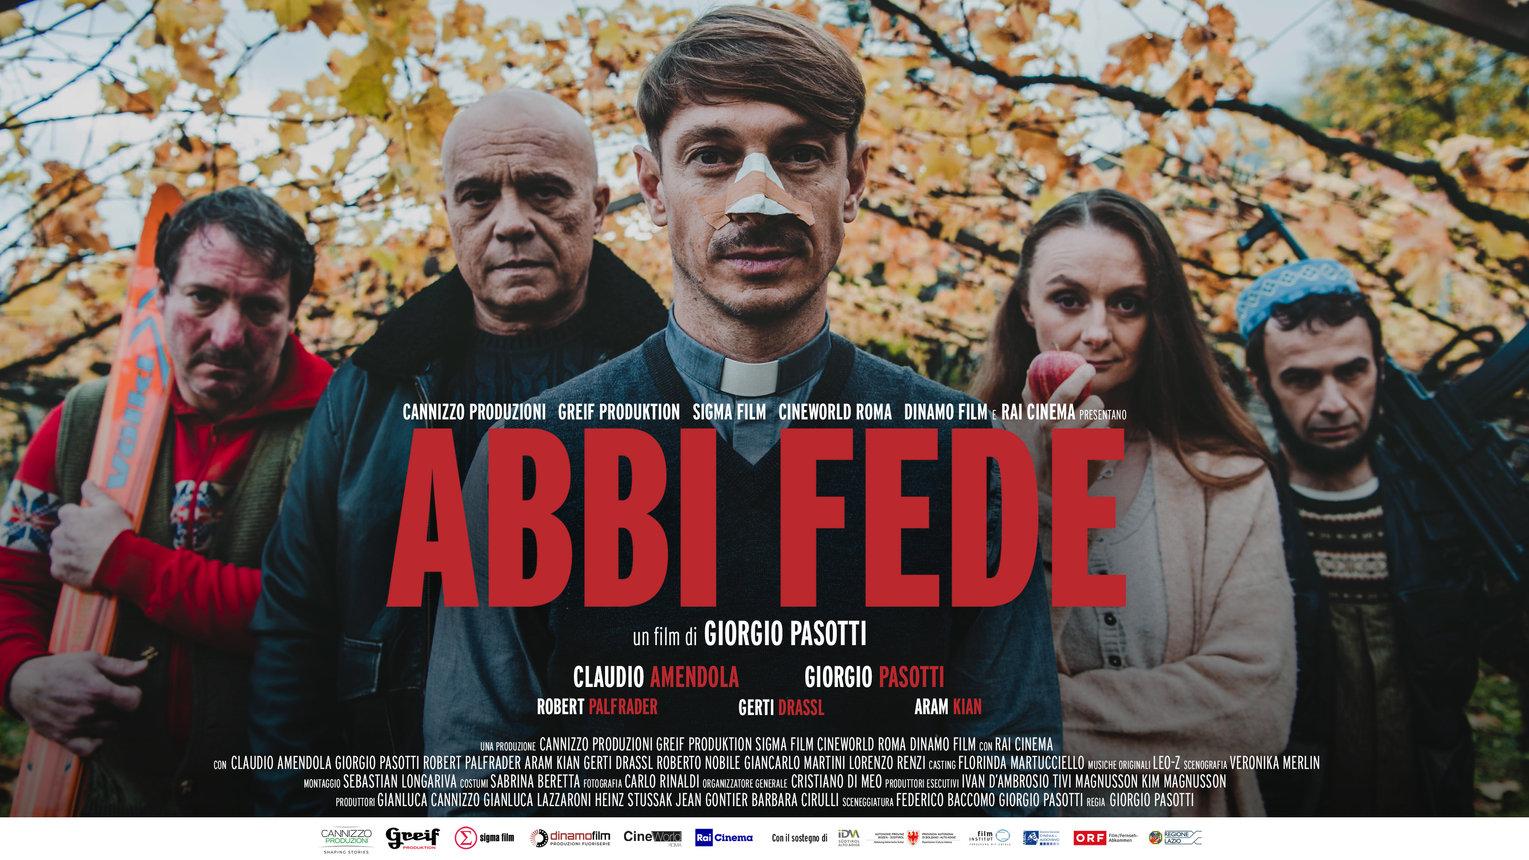 ABBI FEDE_Locandina_ORIZZONTALE.jpg